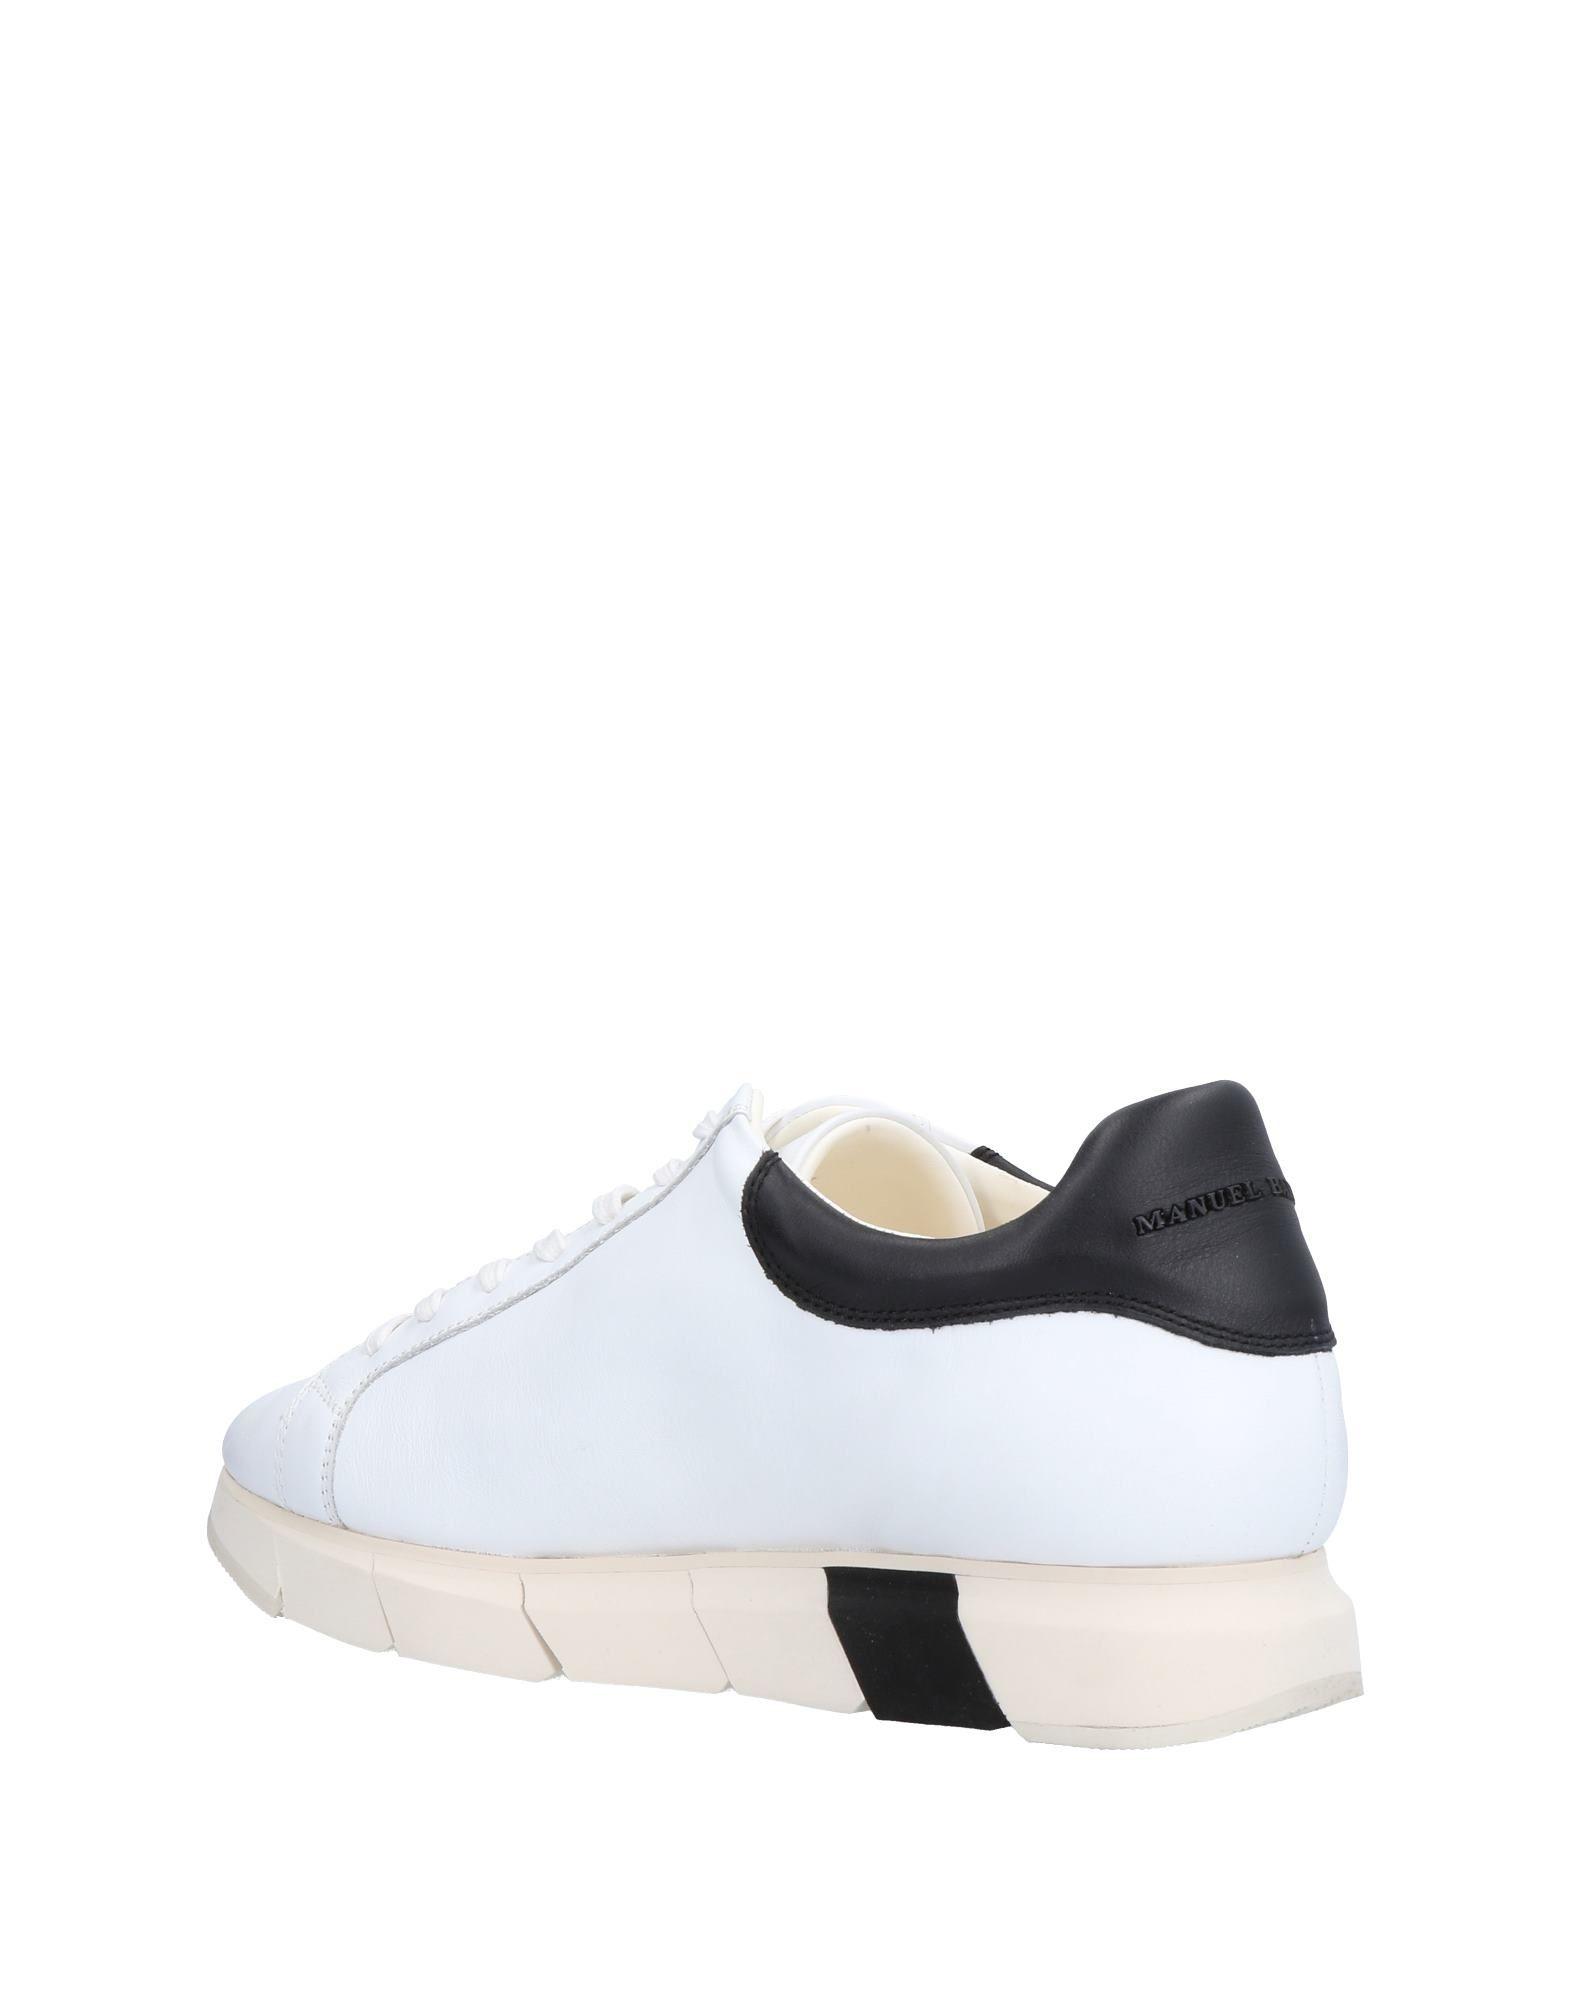 Manuel Barceló Gute Sneakers Herren  11518898NW Gute Barceló Qualität beliebte Schuhe f05111